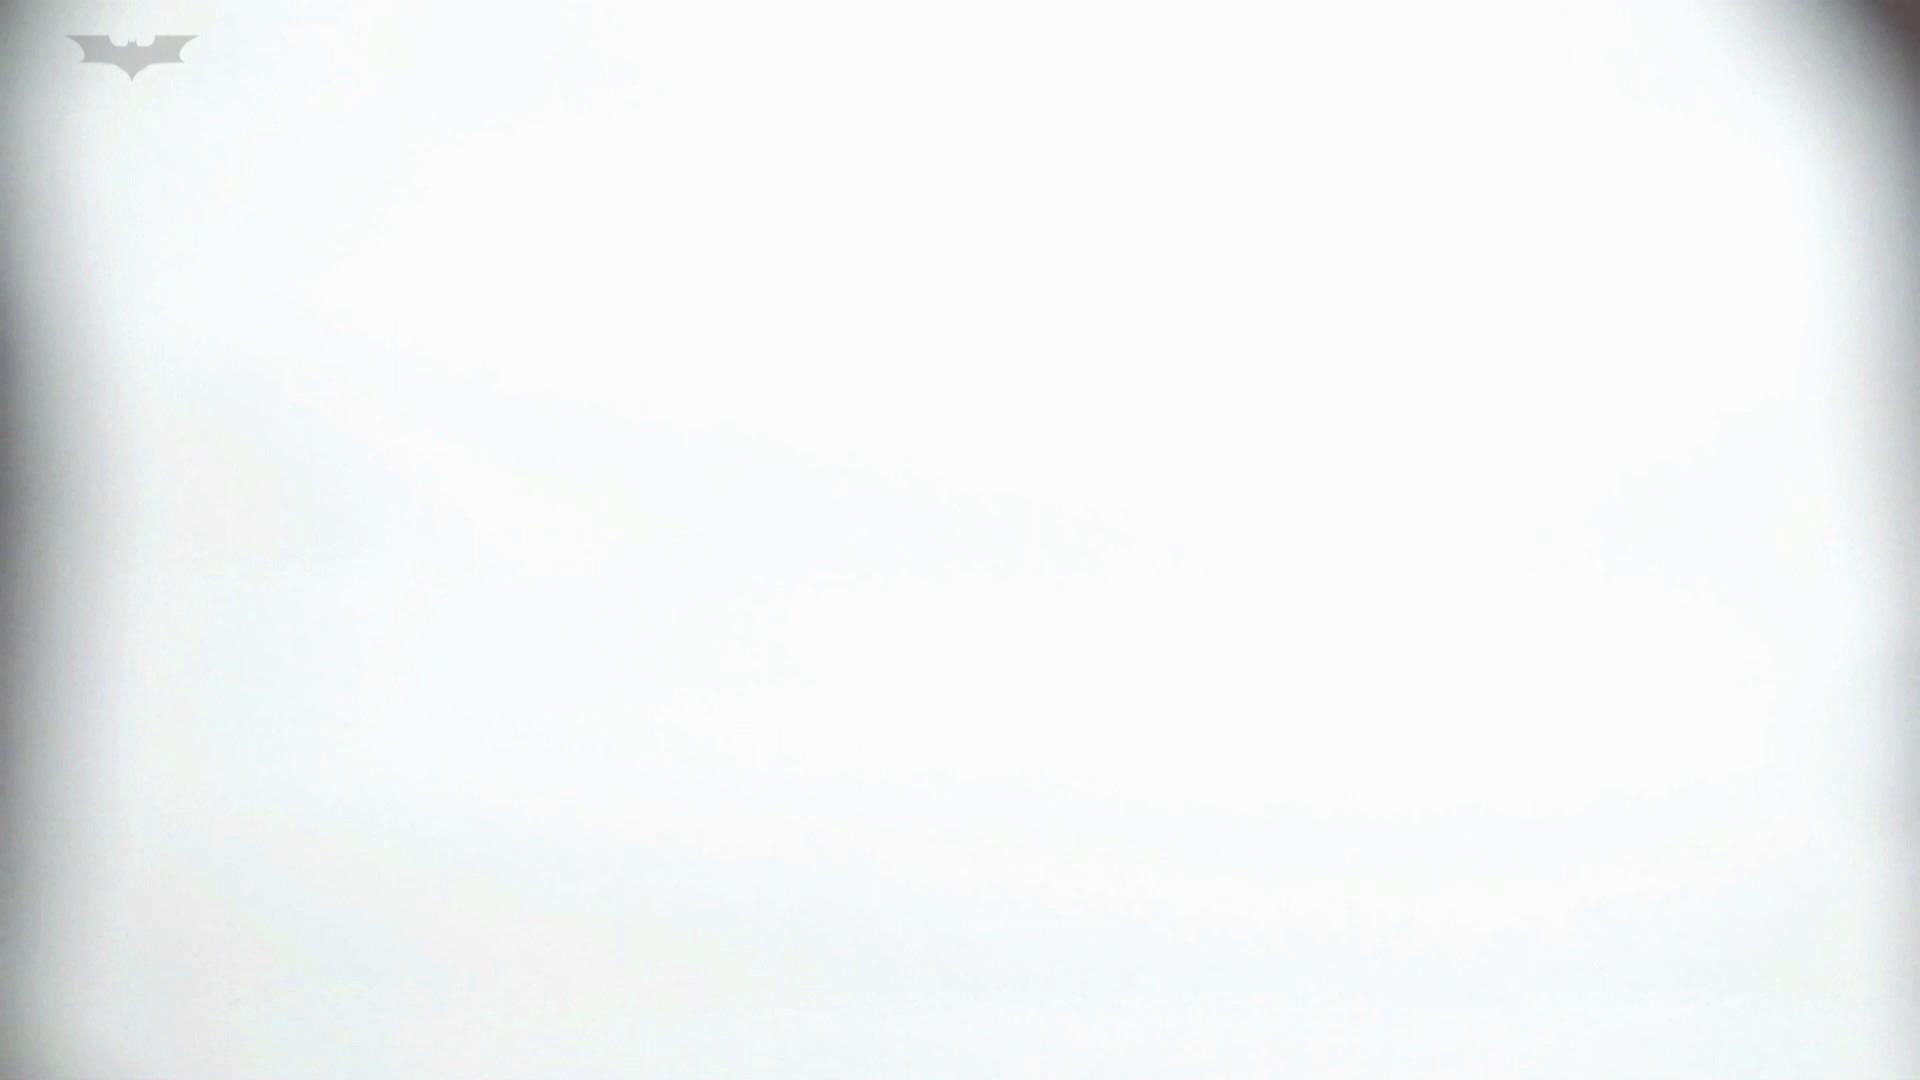 お銀 vol.74 典型的な韓国人美女登場!! 高画質 性交動画流出 89枚 61